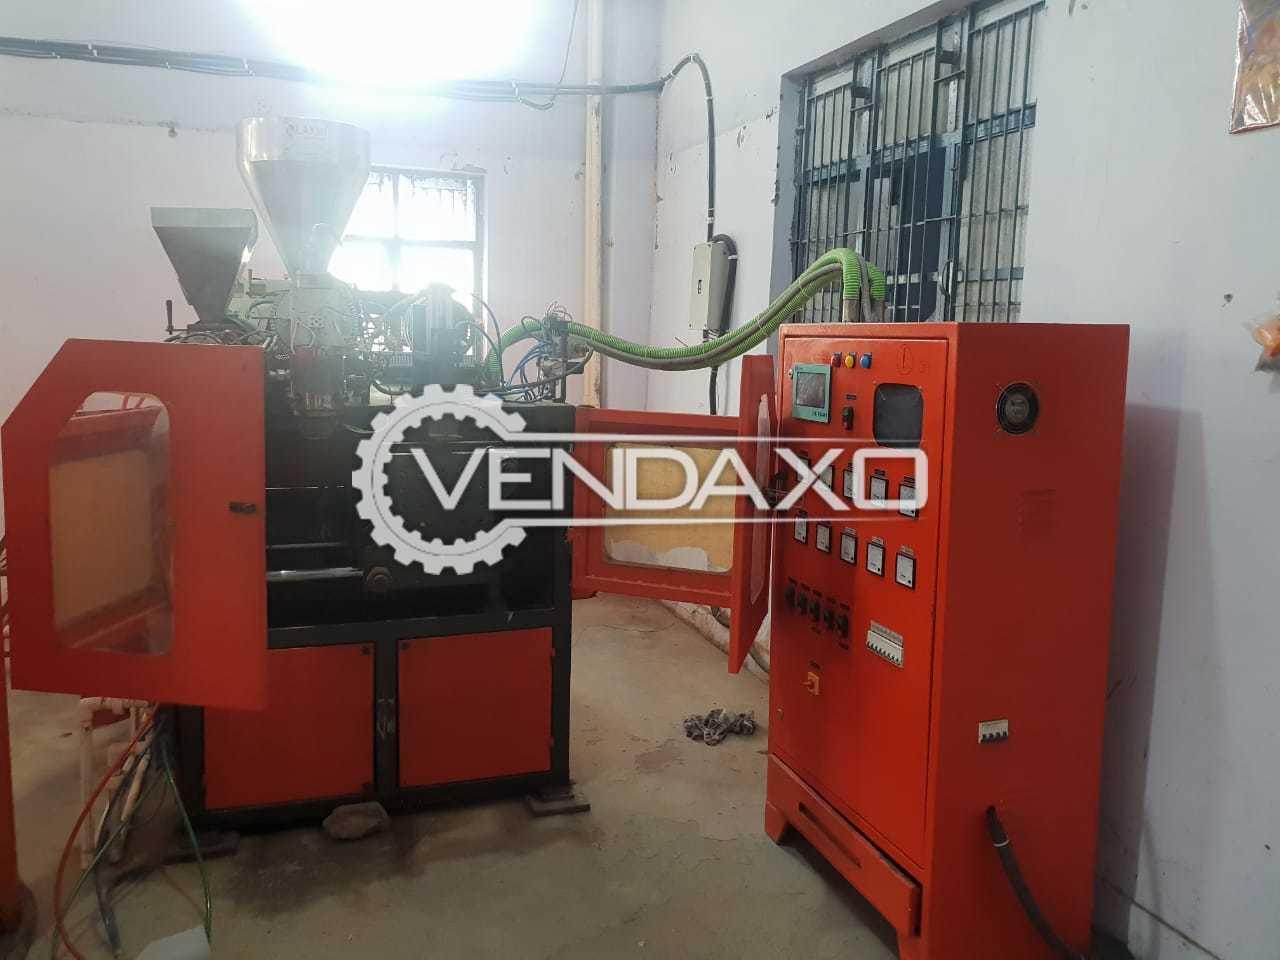 Laxmi Blow Moulding Machine - 1 Liter, 2020 Model